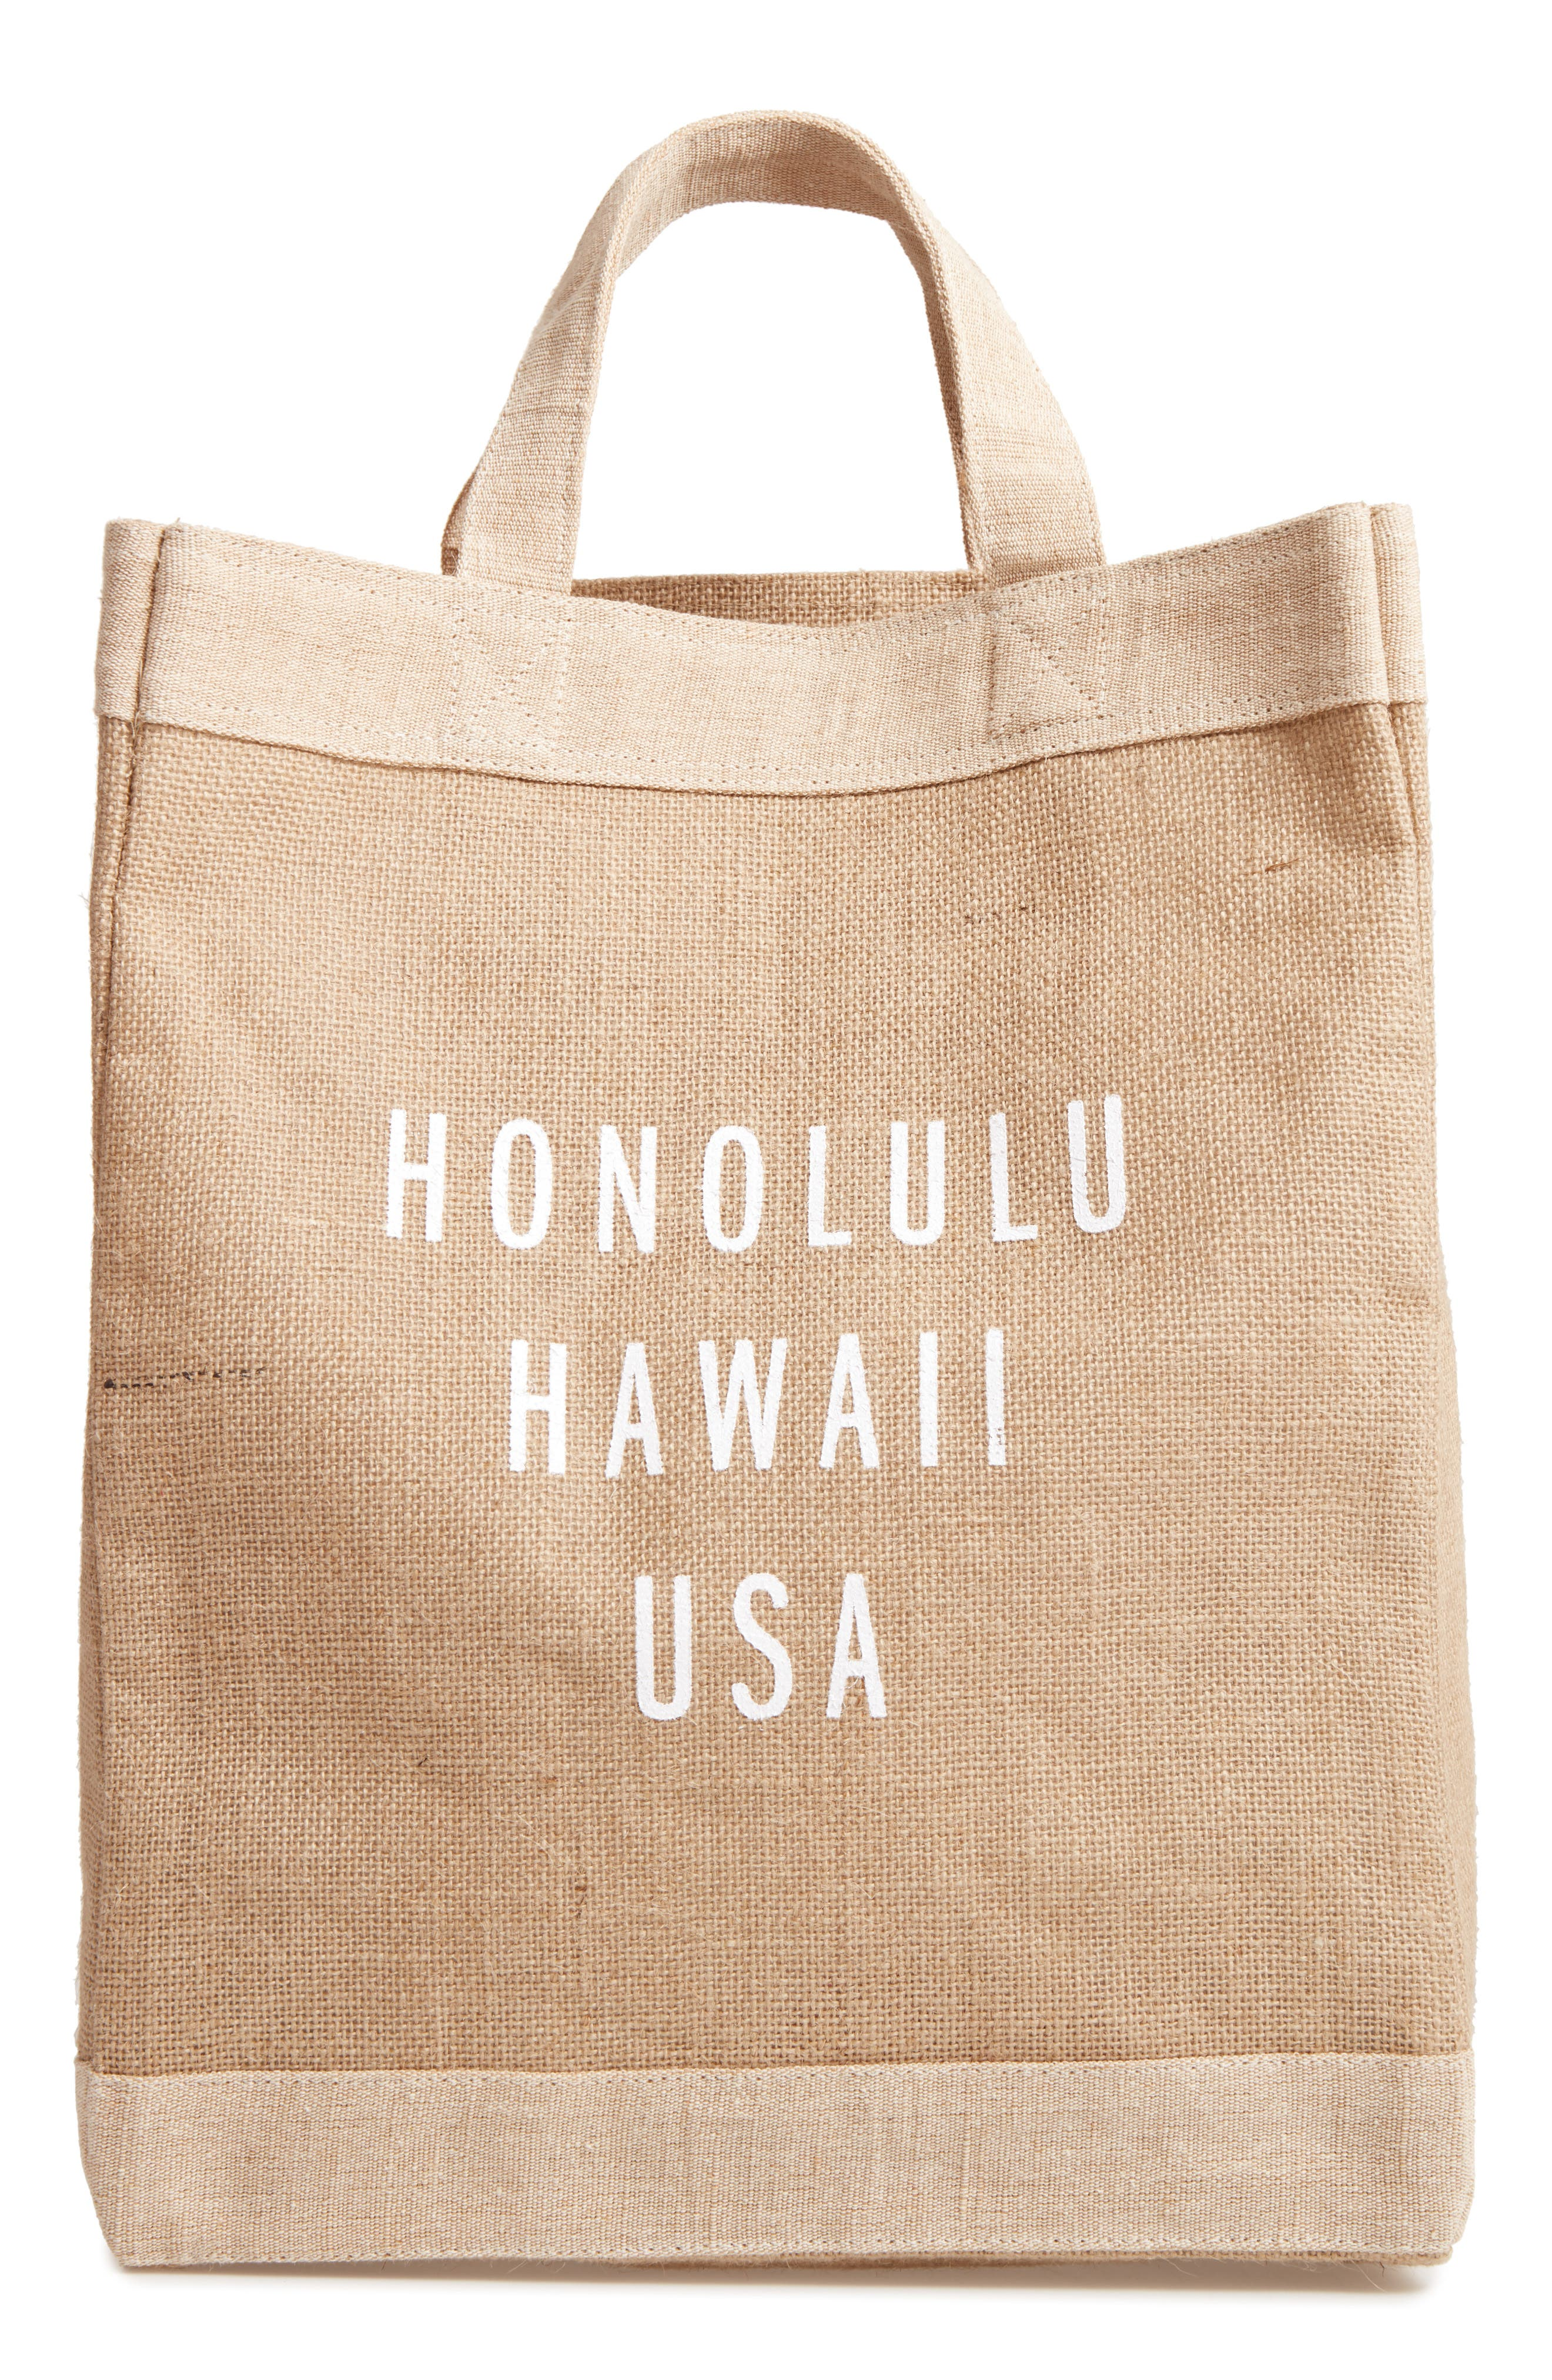 Honolulu Simple Market Bag,                             Main thumbnail 1, color,